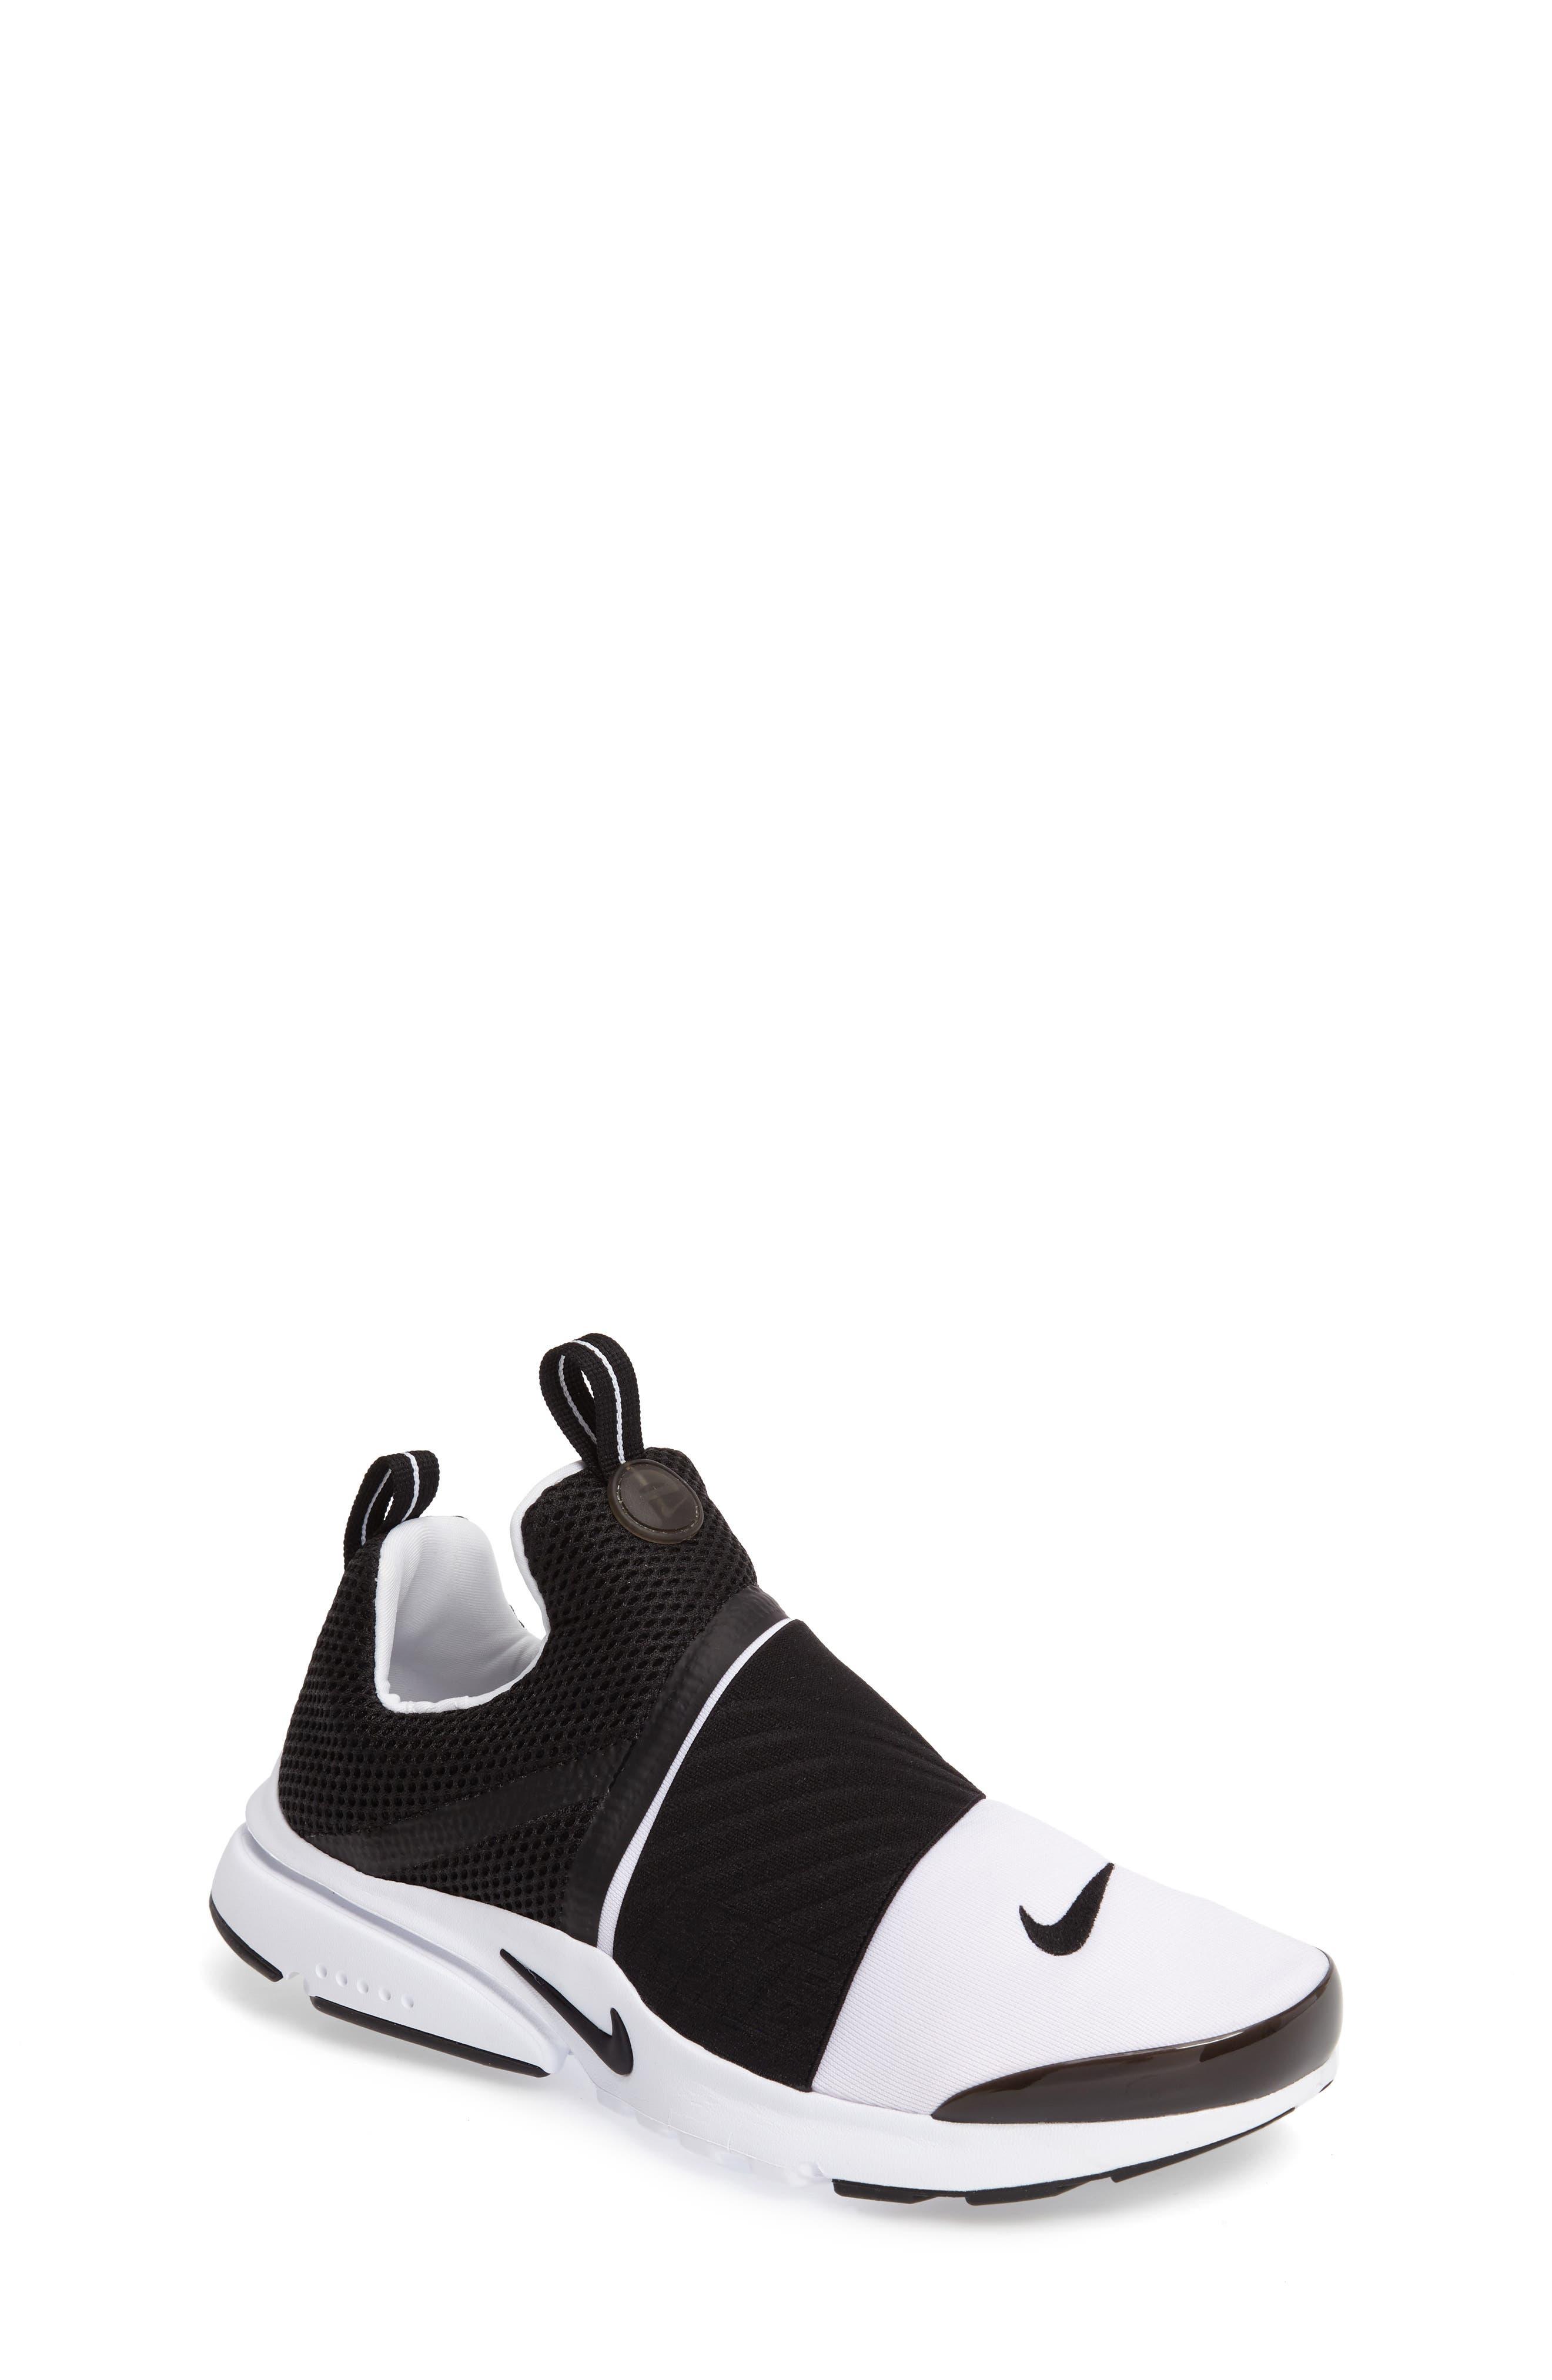 Presto Extreme Sneaker,                             Main thumbnail 7, color,